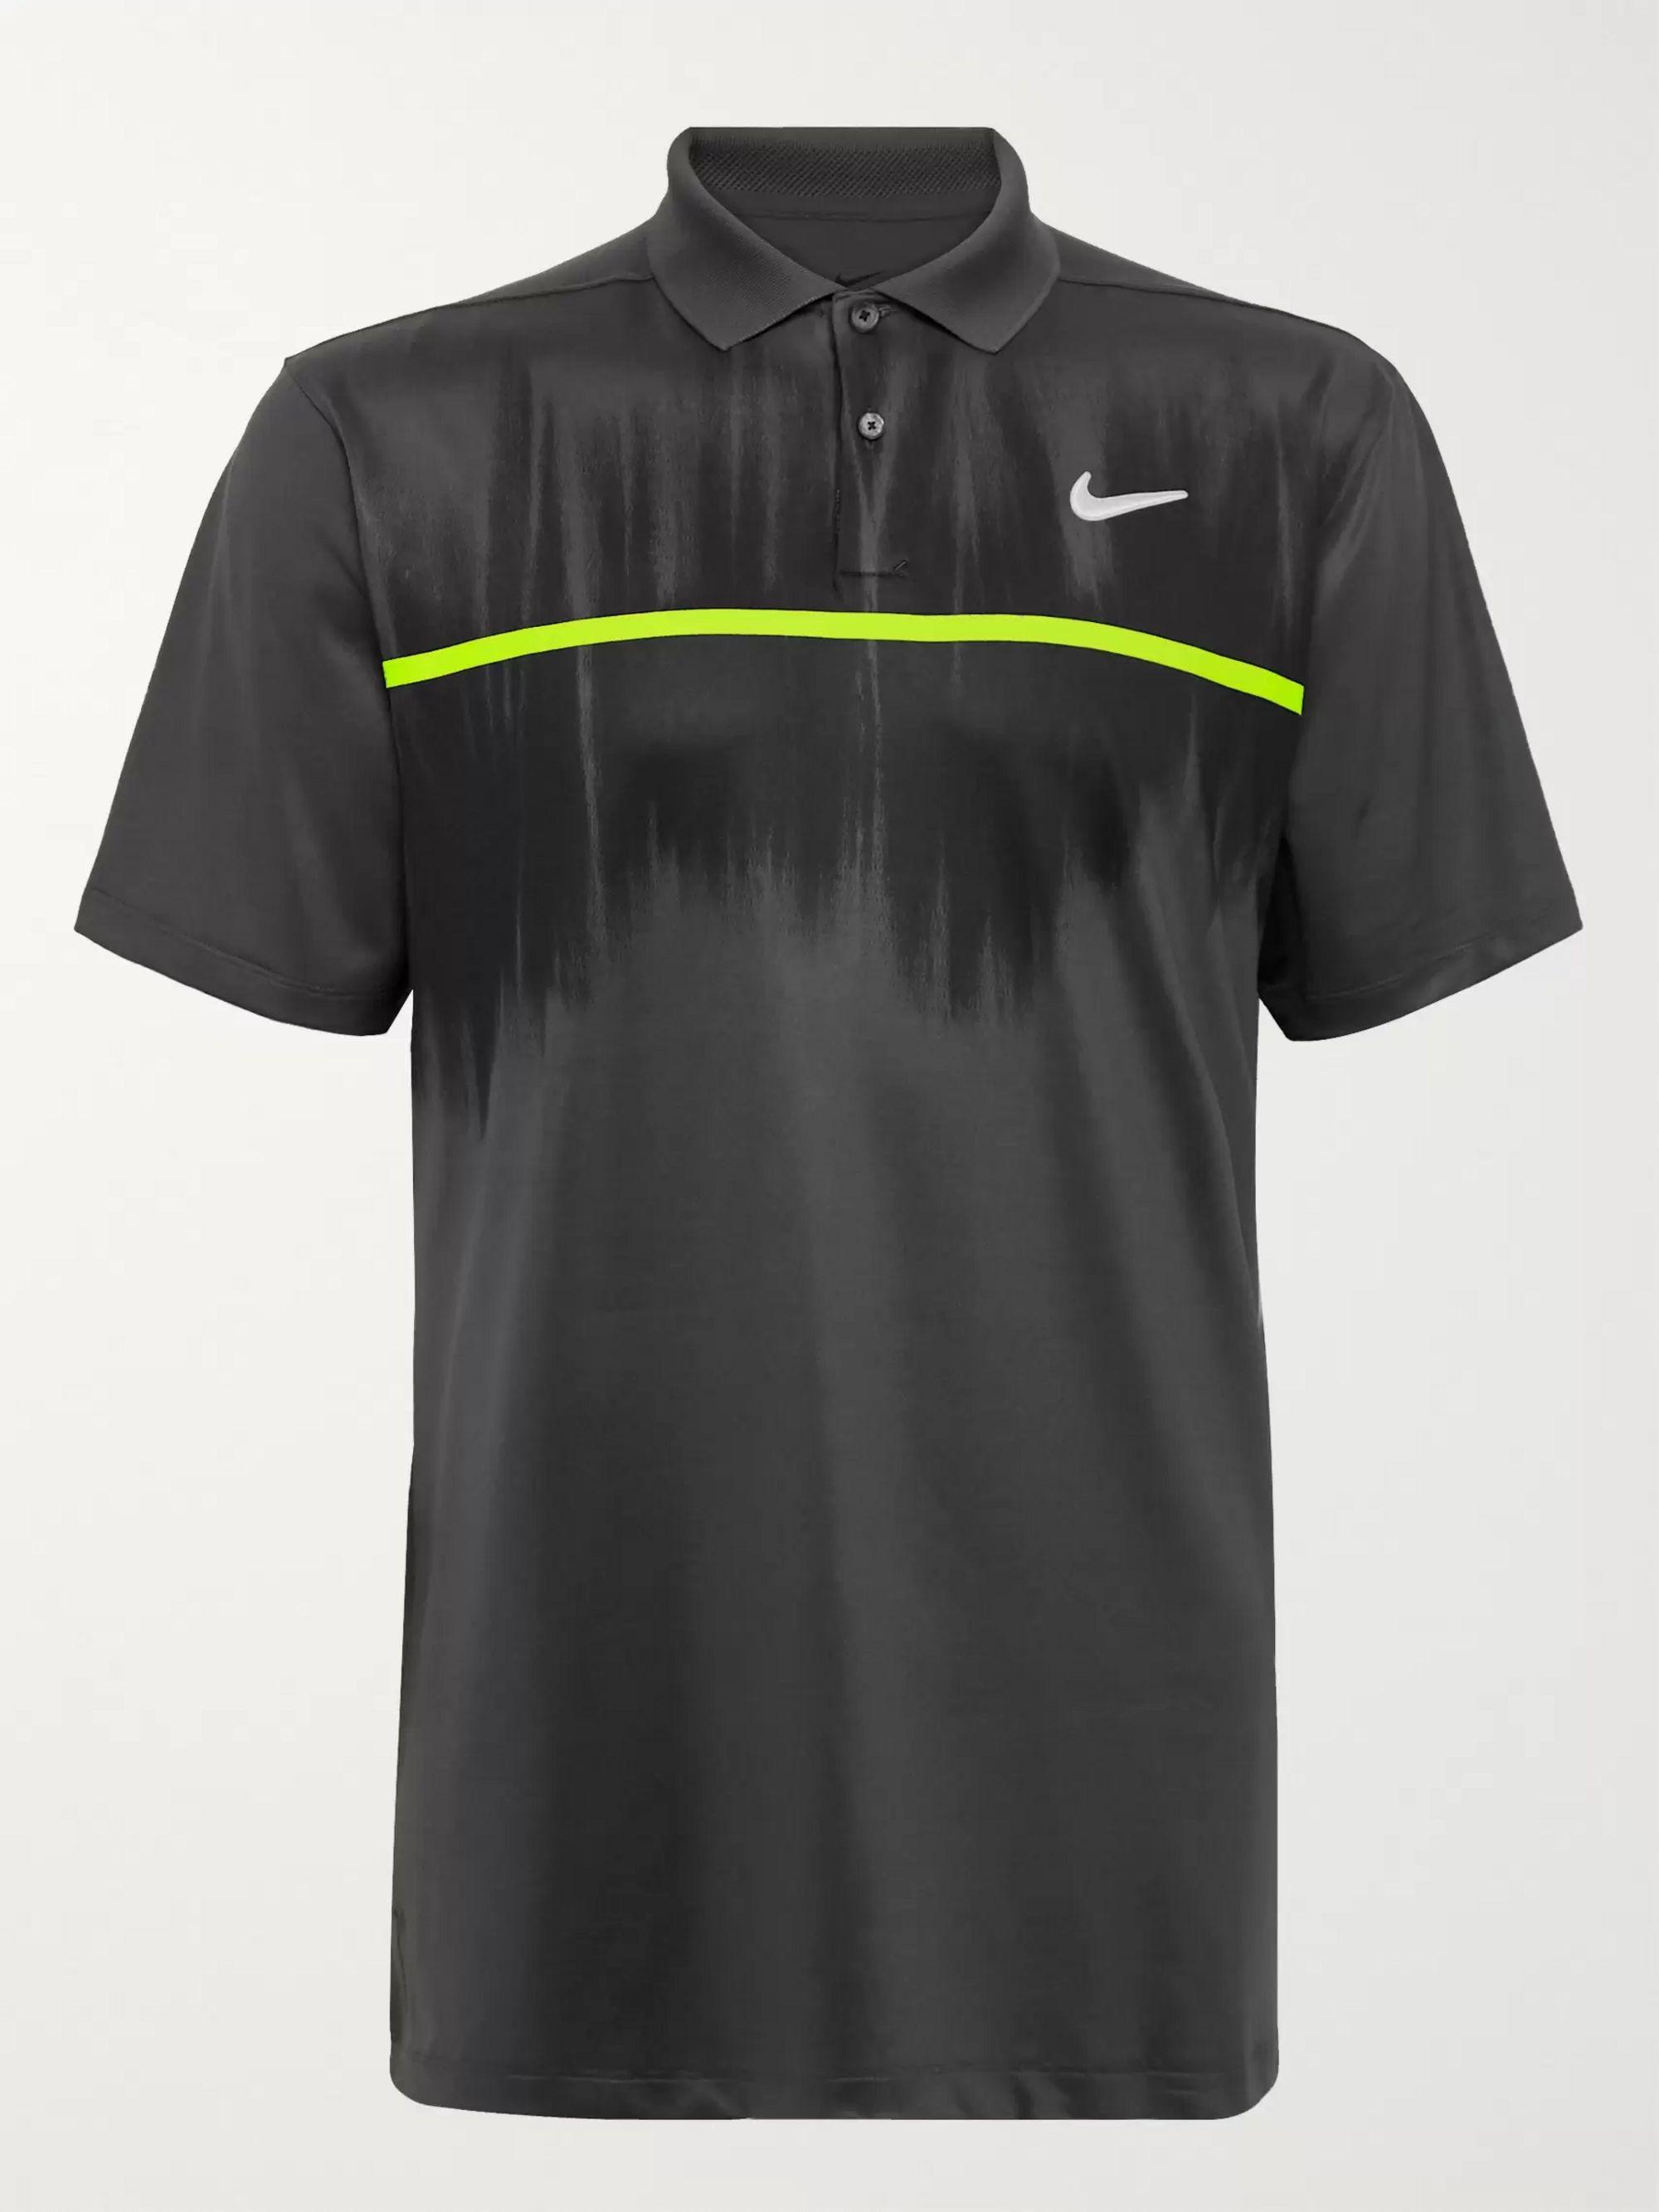 Nike Golf Vapor Printed Dri-FIT Golf Polo Shirt